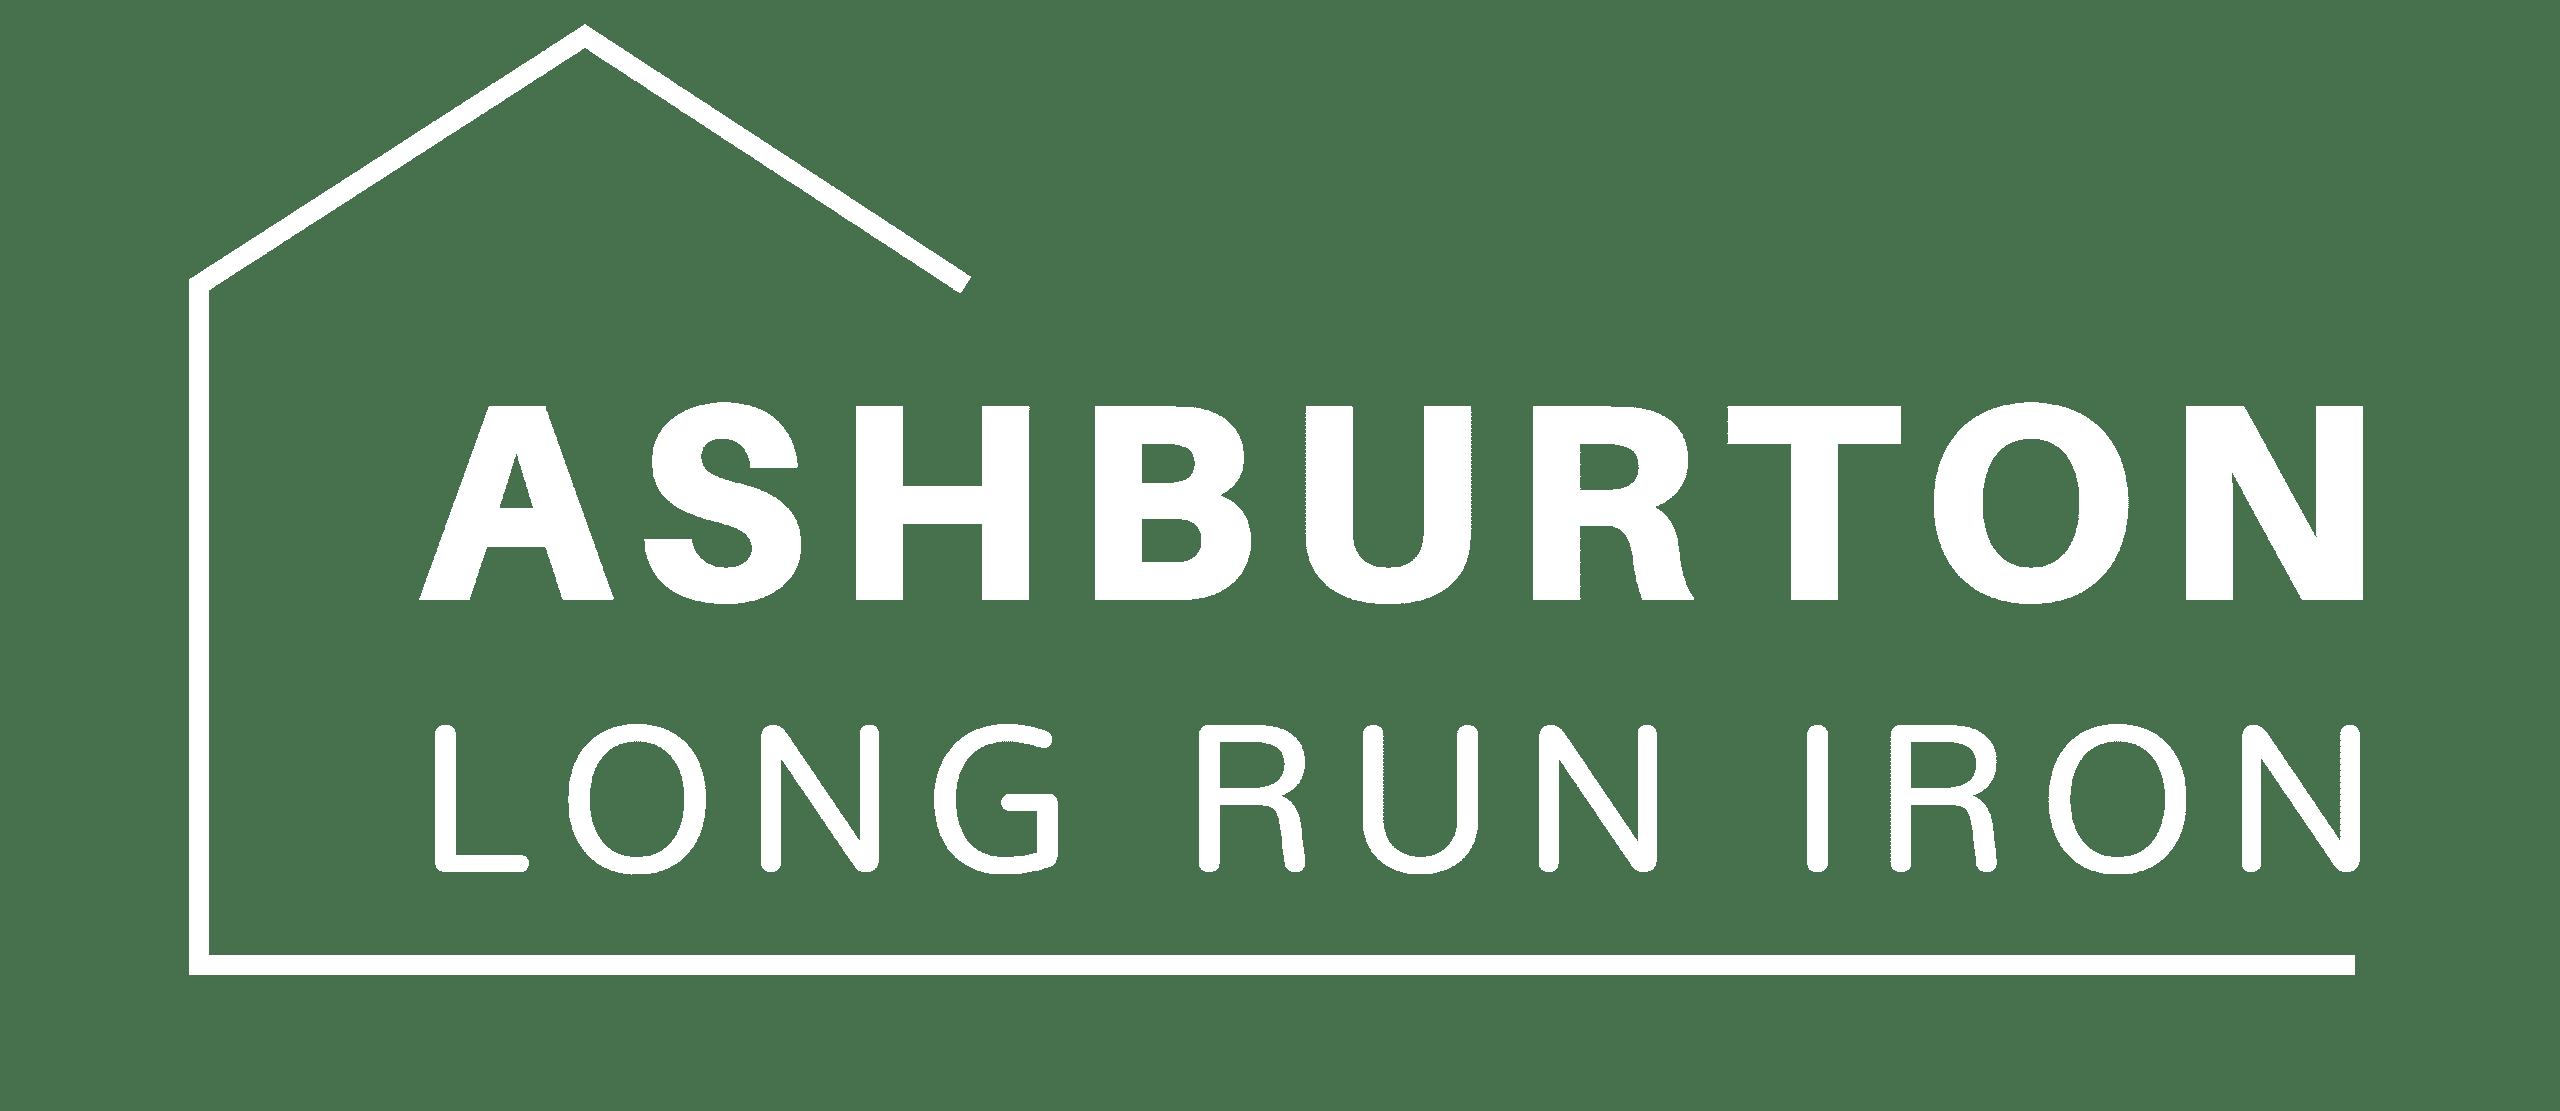 Ashburton Long Run Iron